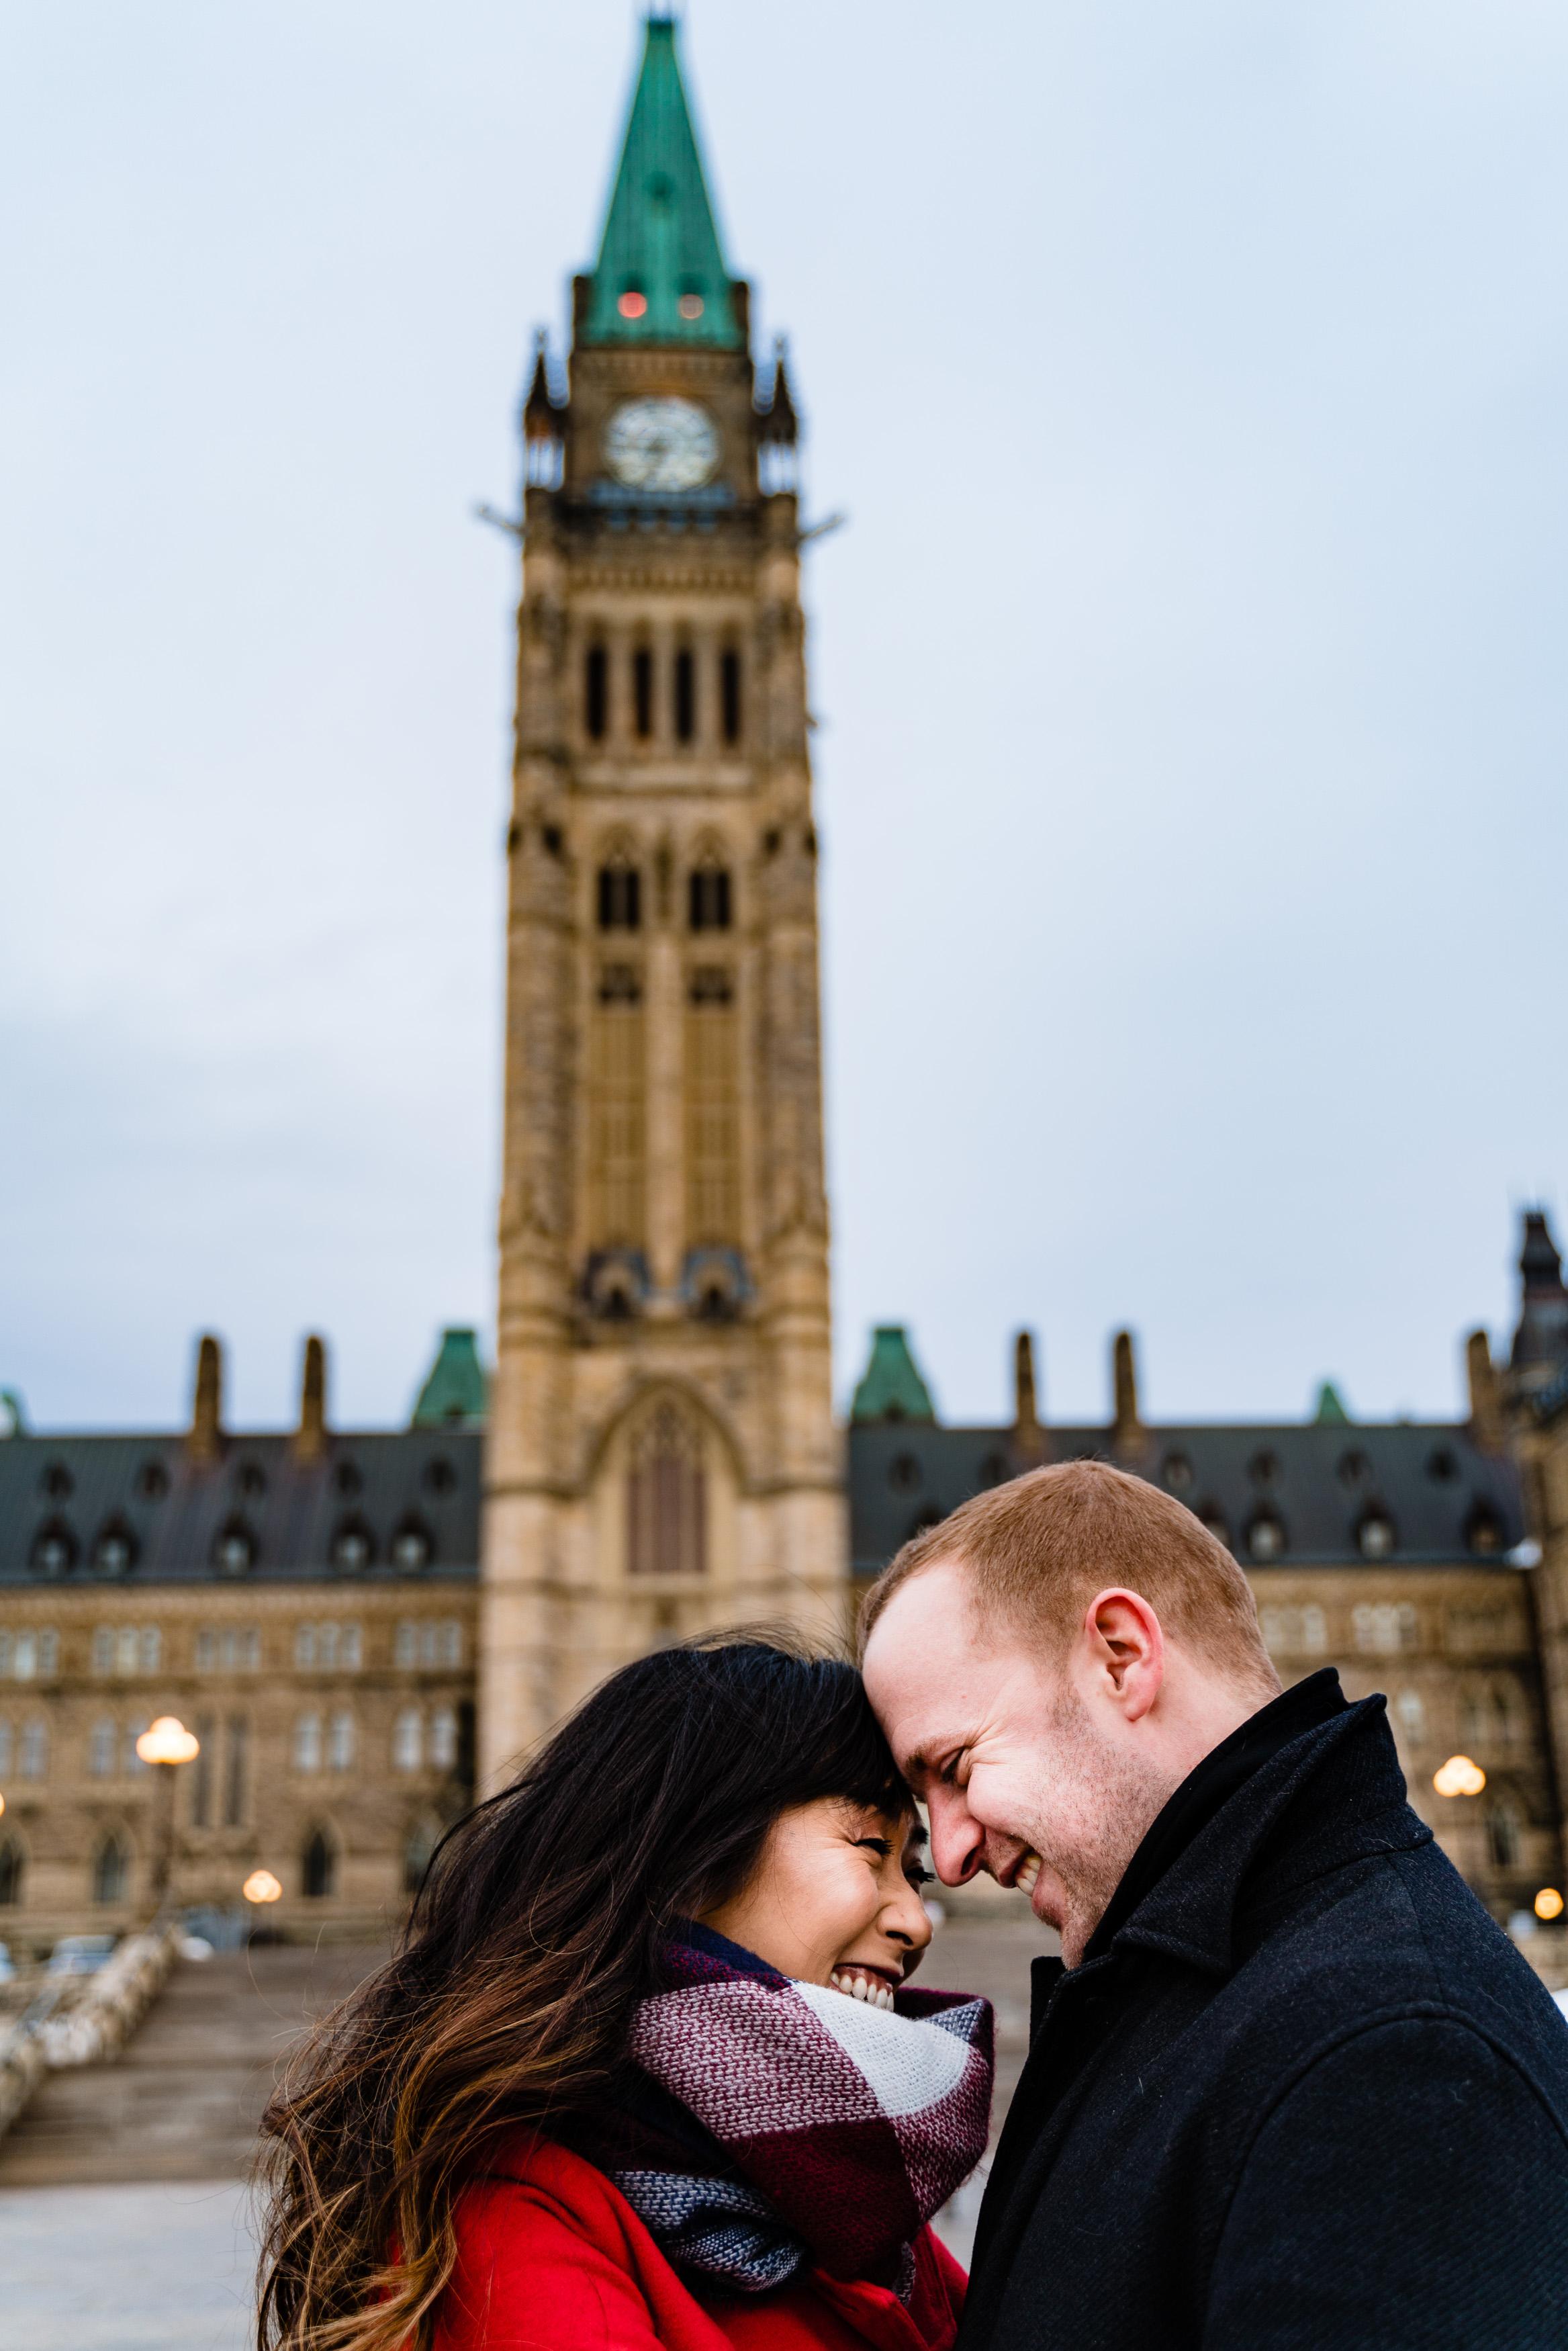 Anna&Chris-Ottawa-engagement-couples-ontario-halifax-novascotia-winter4ottawa-ontario-engagementphotography-wedding-foxandfellow-winter.jpg